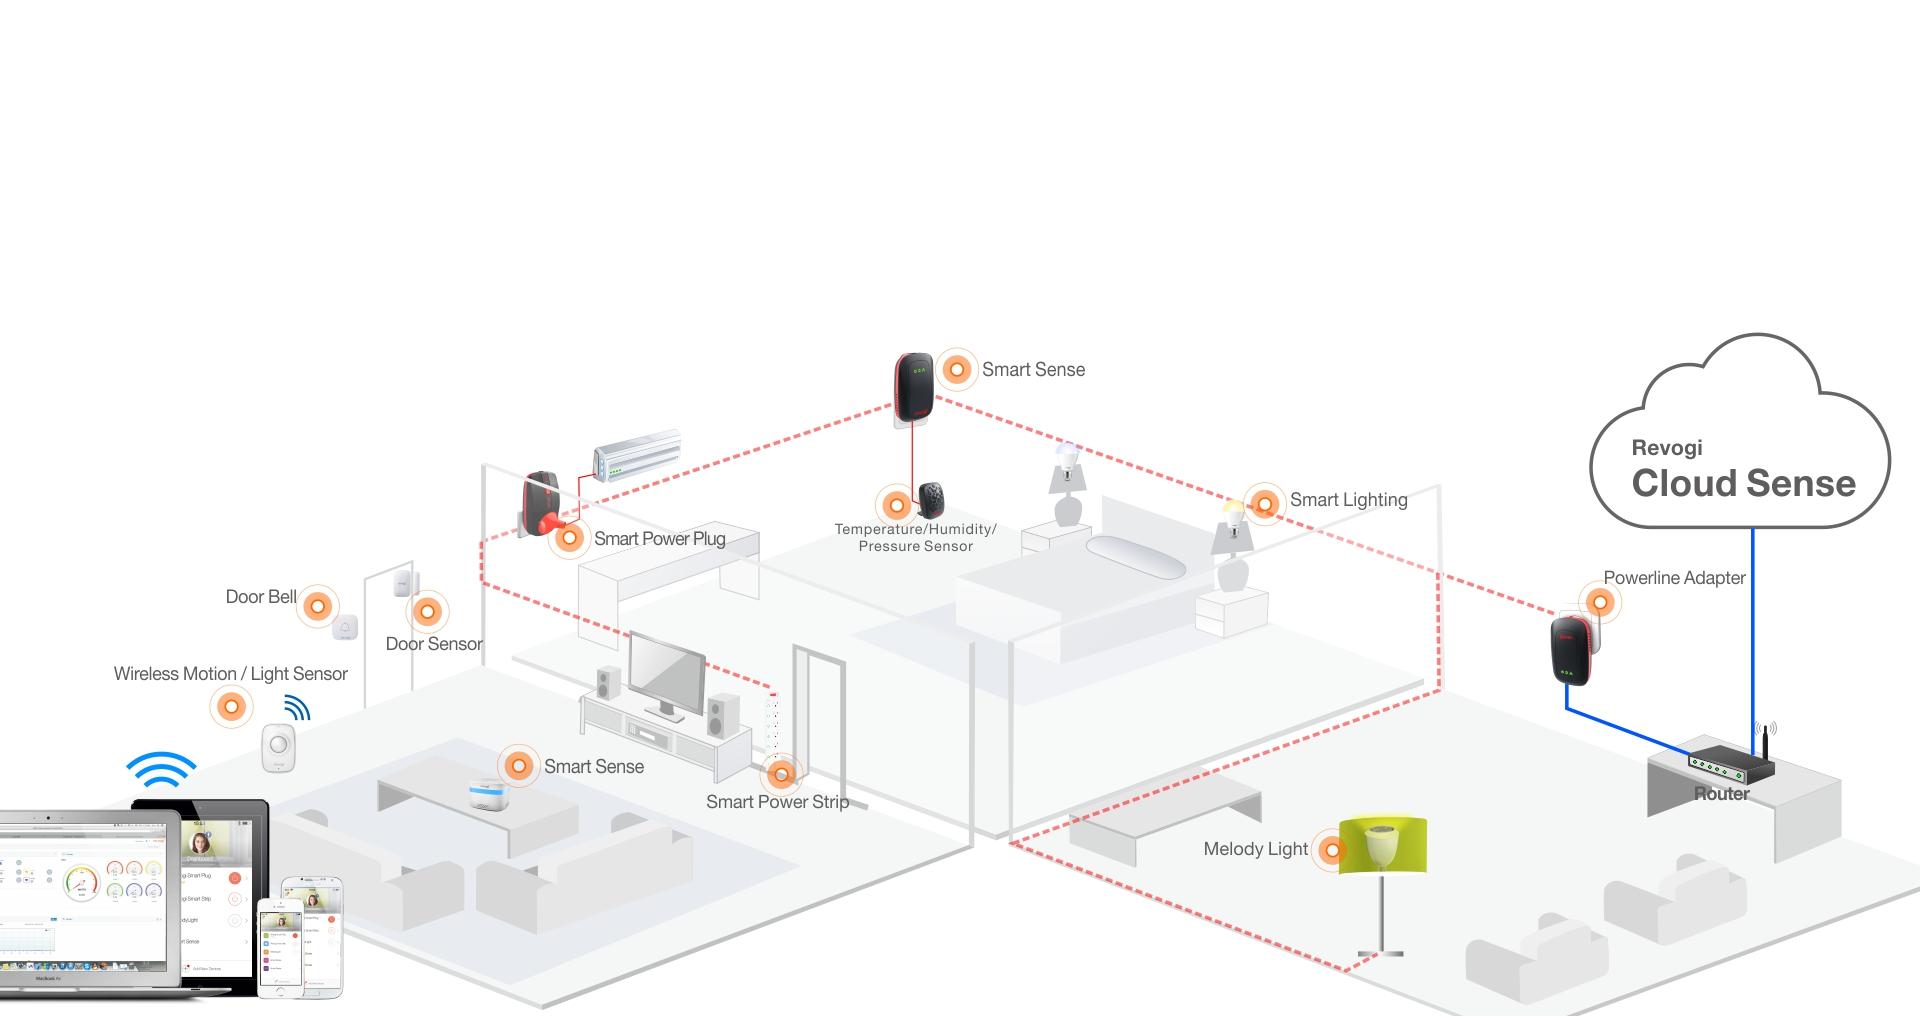 Smart Networking Revogi Innovation Co Ltd